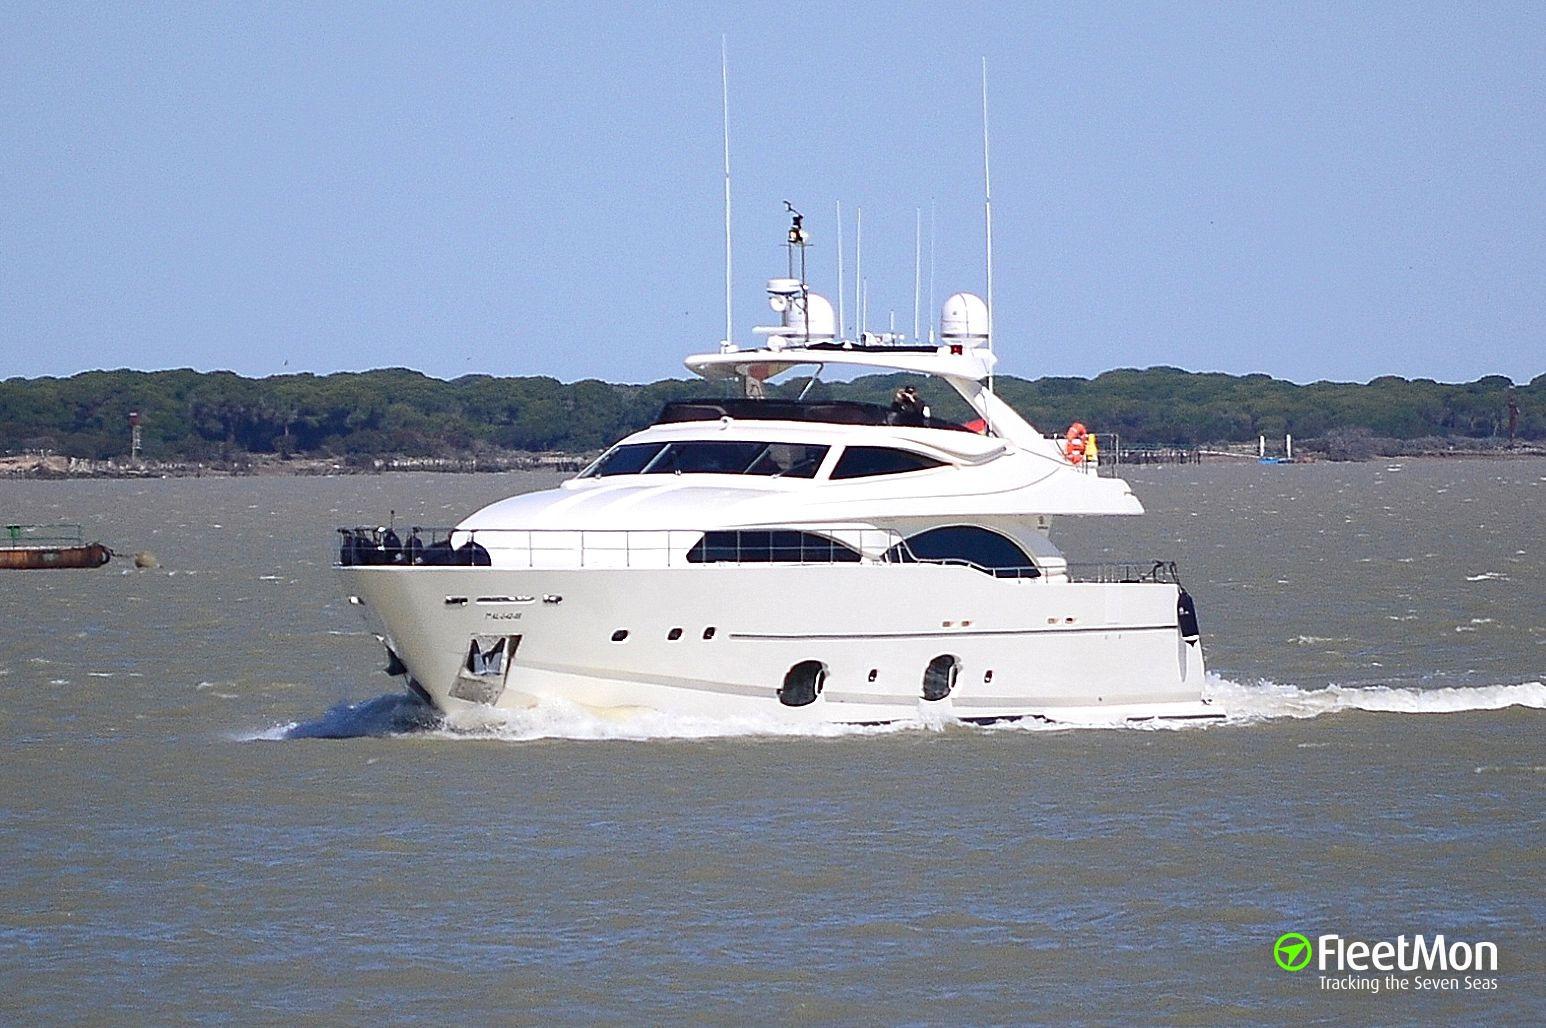 Schiff TIO CARLOS CUARTO (Yacht) IMO 356210, MMSI 224421640